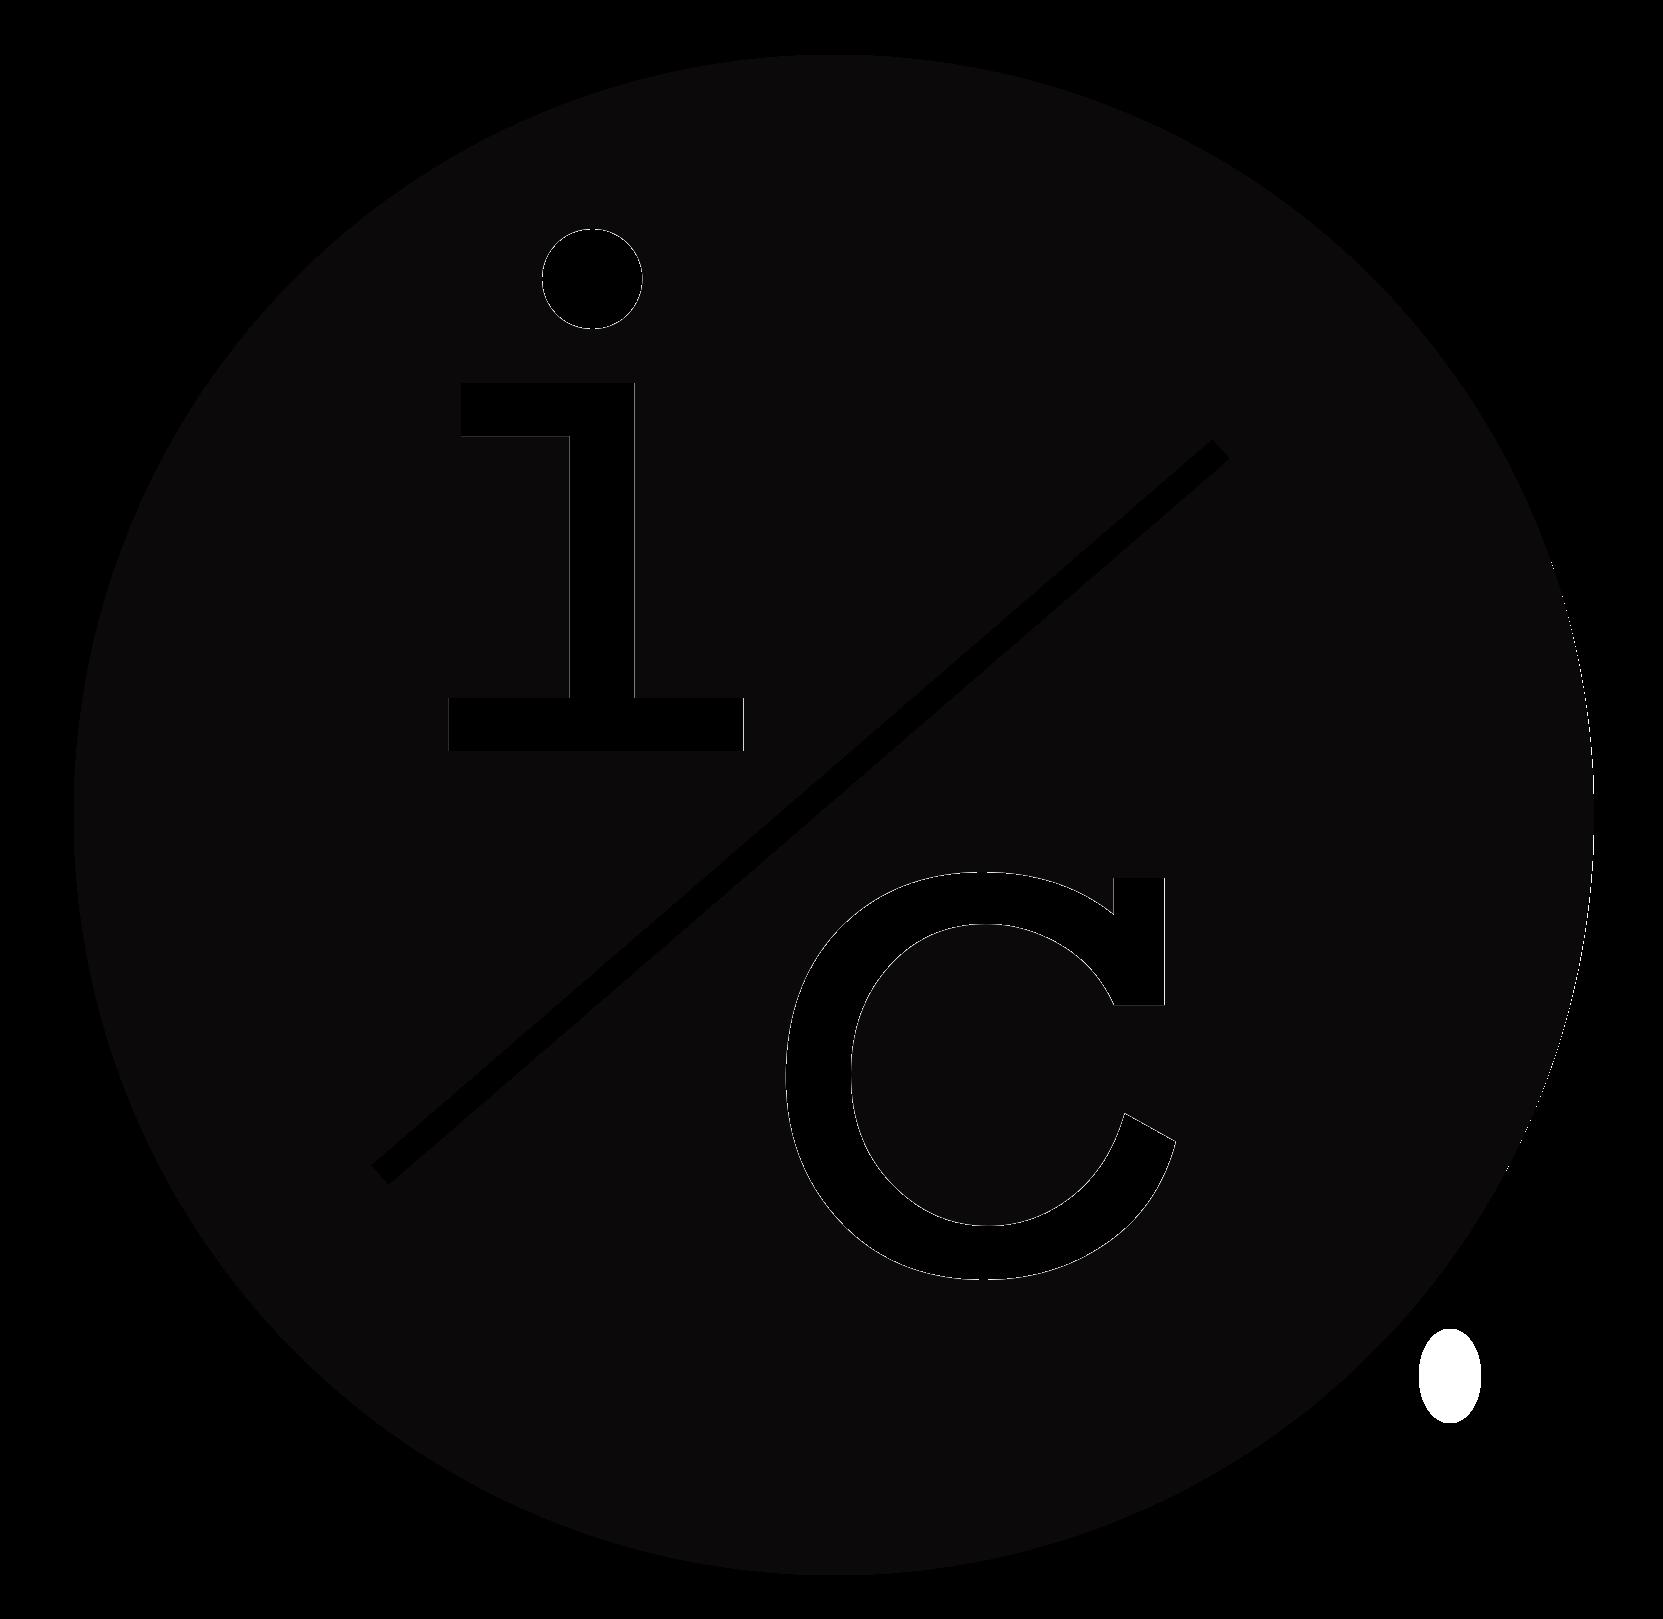 imagecontext